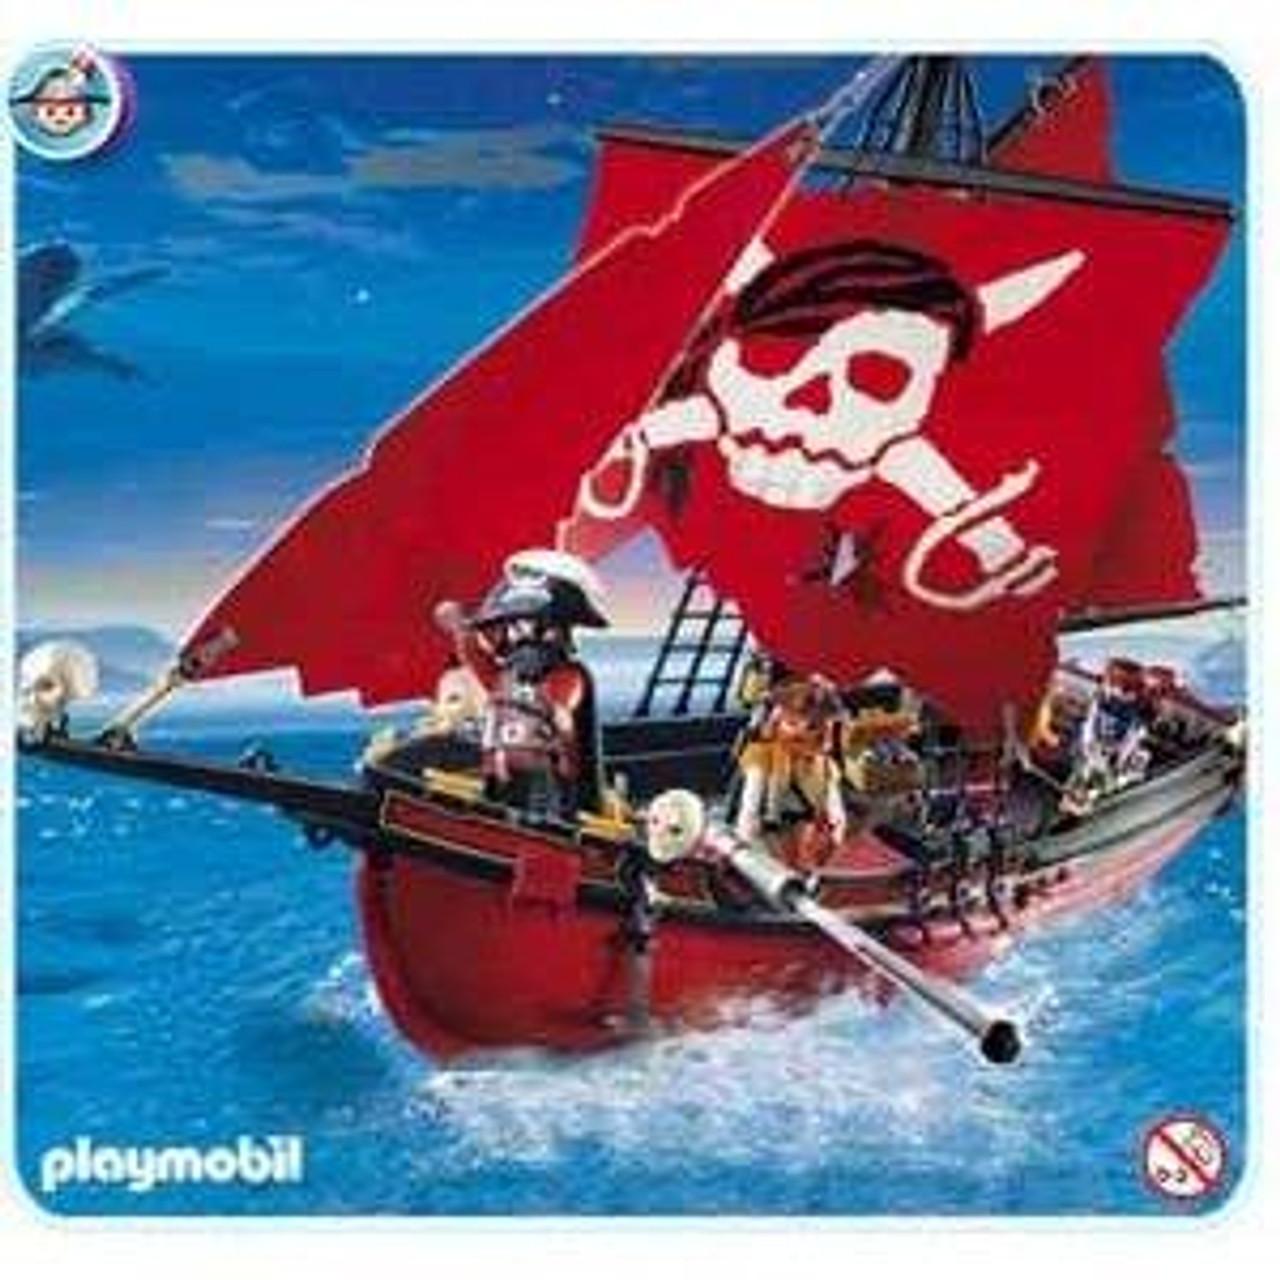 Playmobil Pirates Red Corsair Set #5869